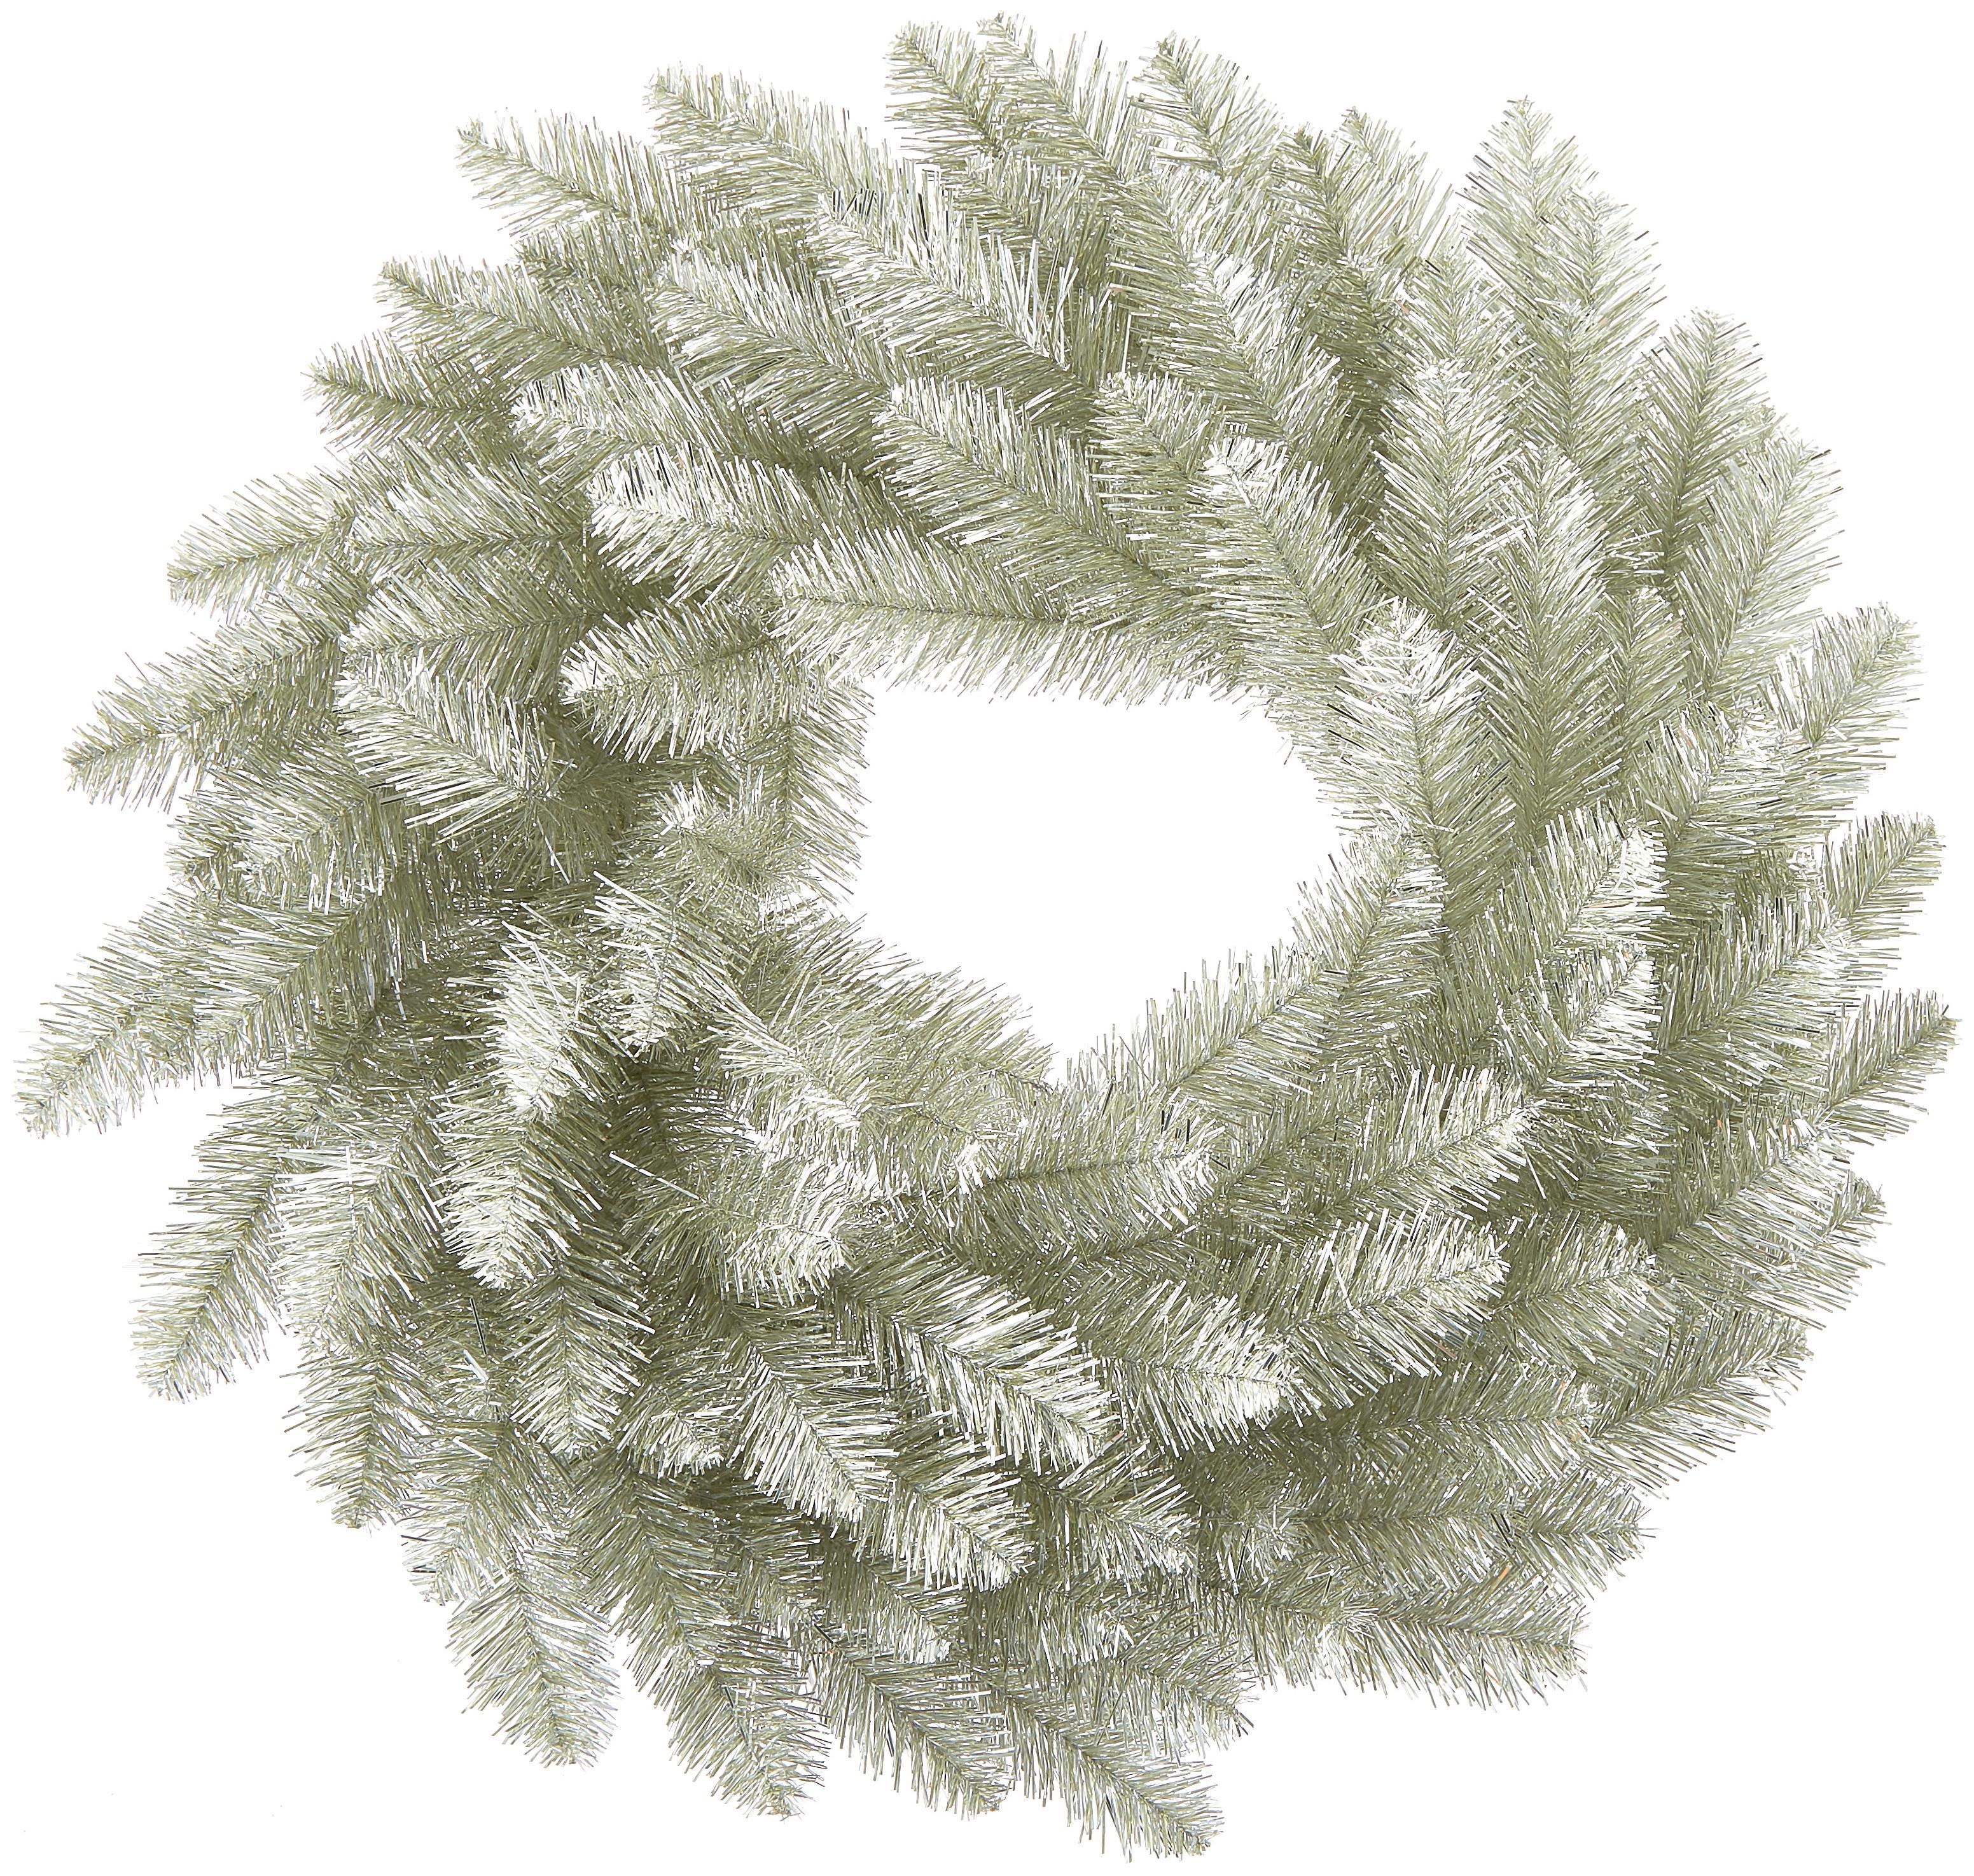 Decoratieve kerstkrans Colchester, Kunststof (PVC), Platinakleurigkleurig, Ø 60 cm